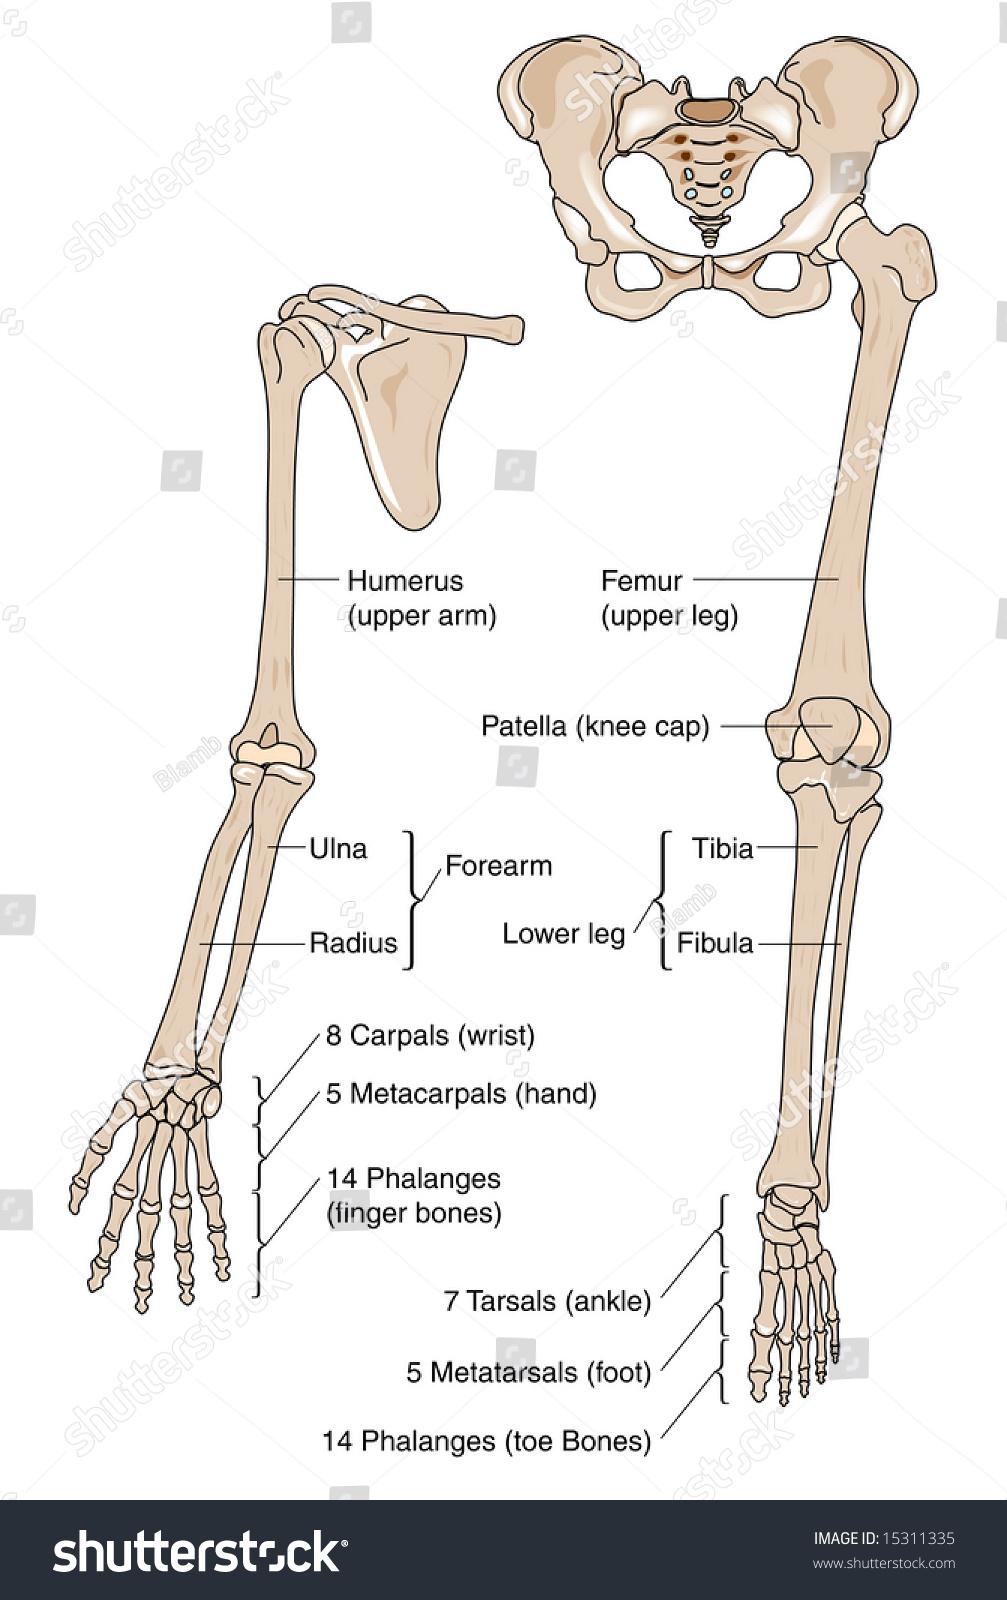 Human Limb Bones Labeled Stock Illustration 15311335 Shutterstock